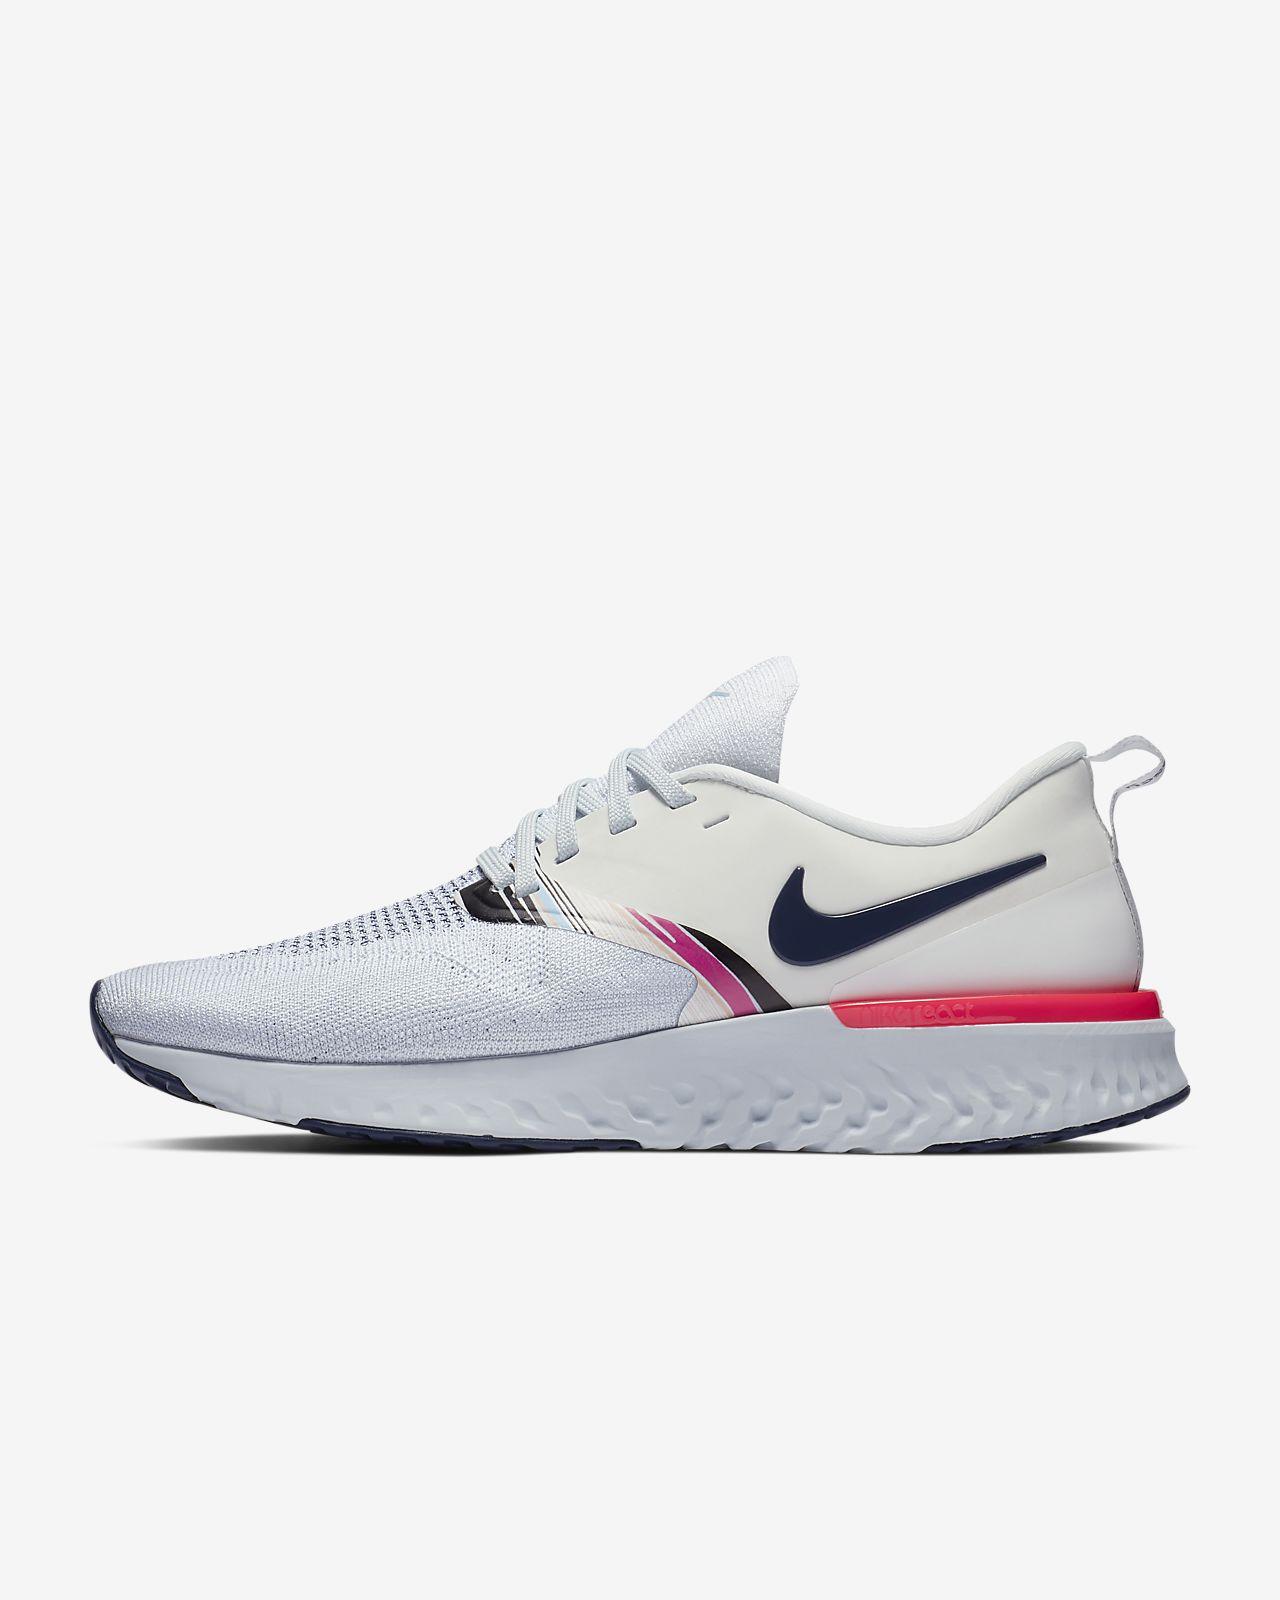 612aef20 Nike Odyssey React Flyknit 2 Premium løpesko til dame. Nike.com NO